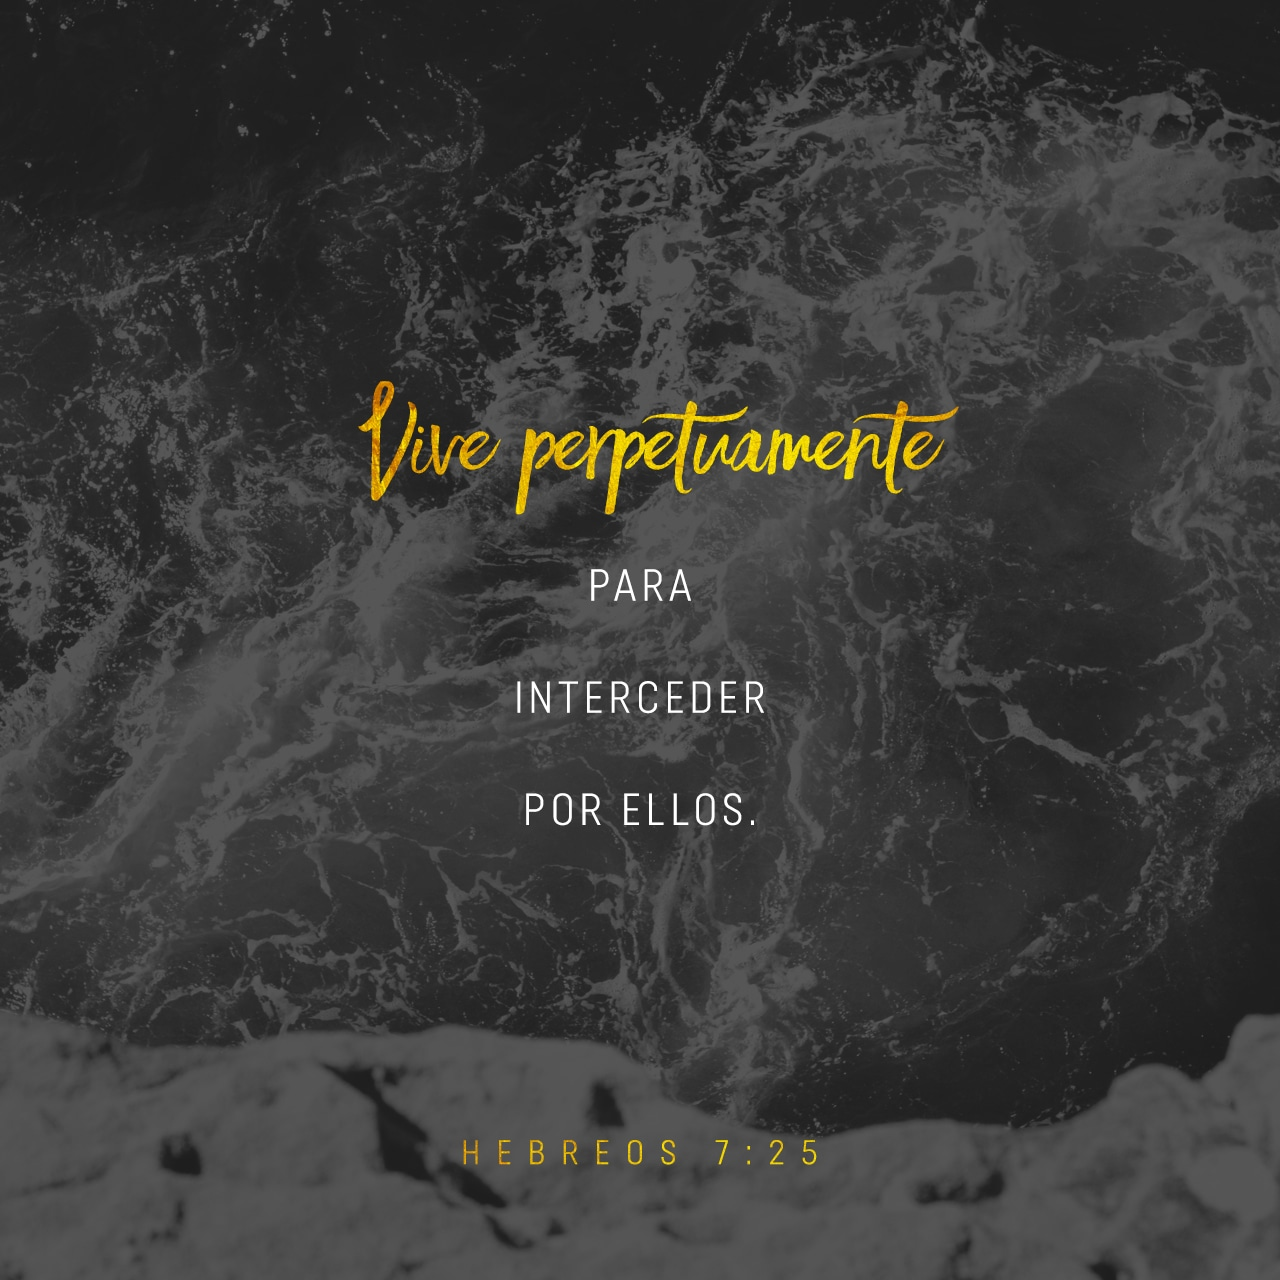 Hebrews 7:25 (JPG)